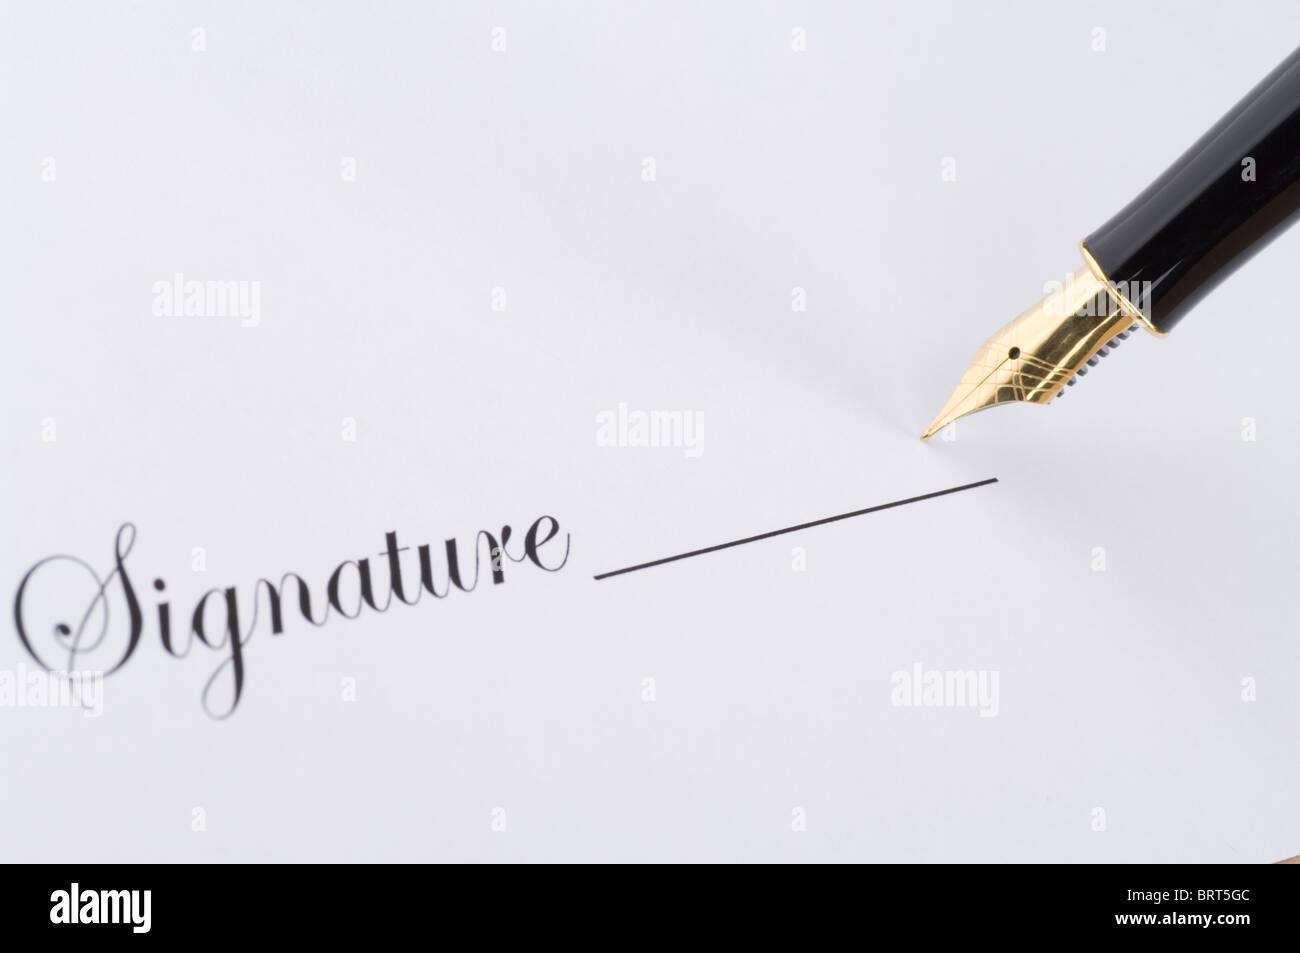 Signatur mit gold Stift Stockbild